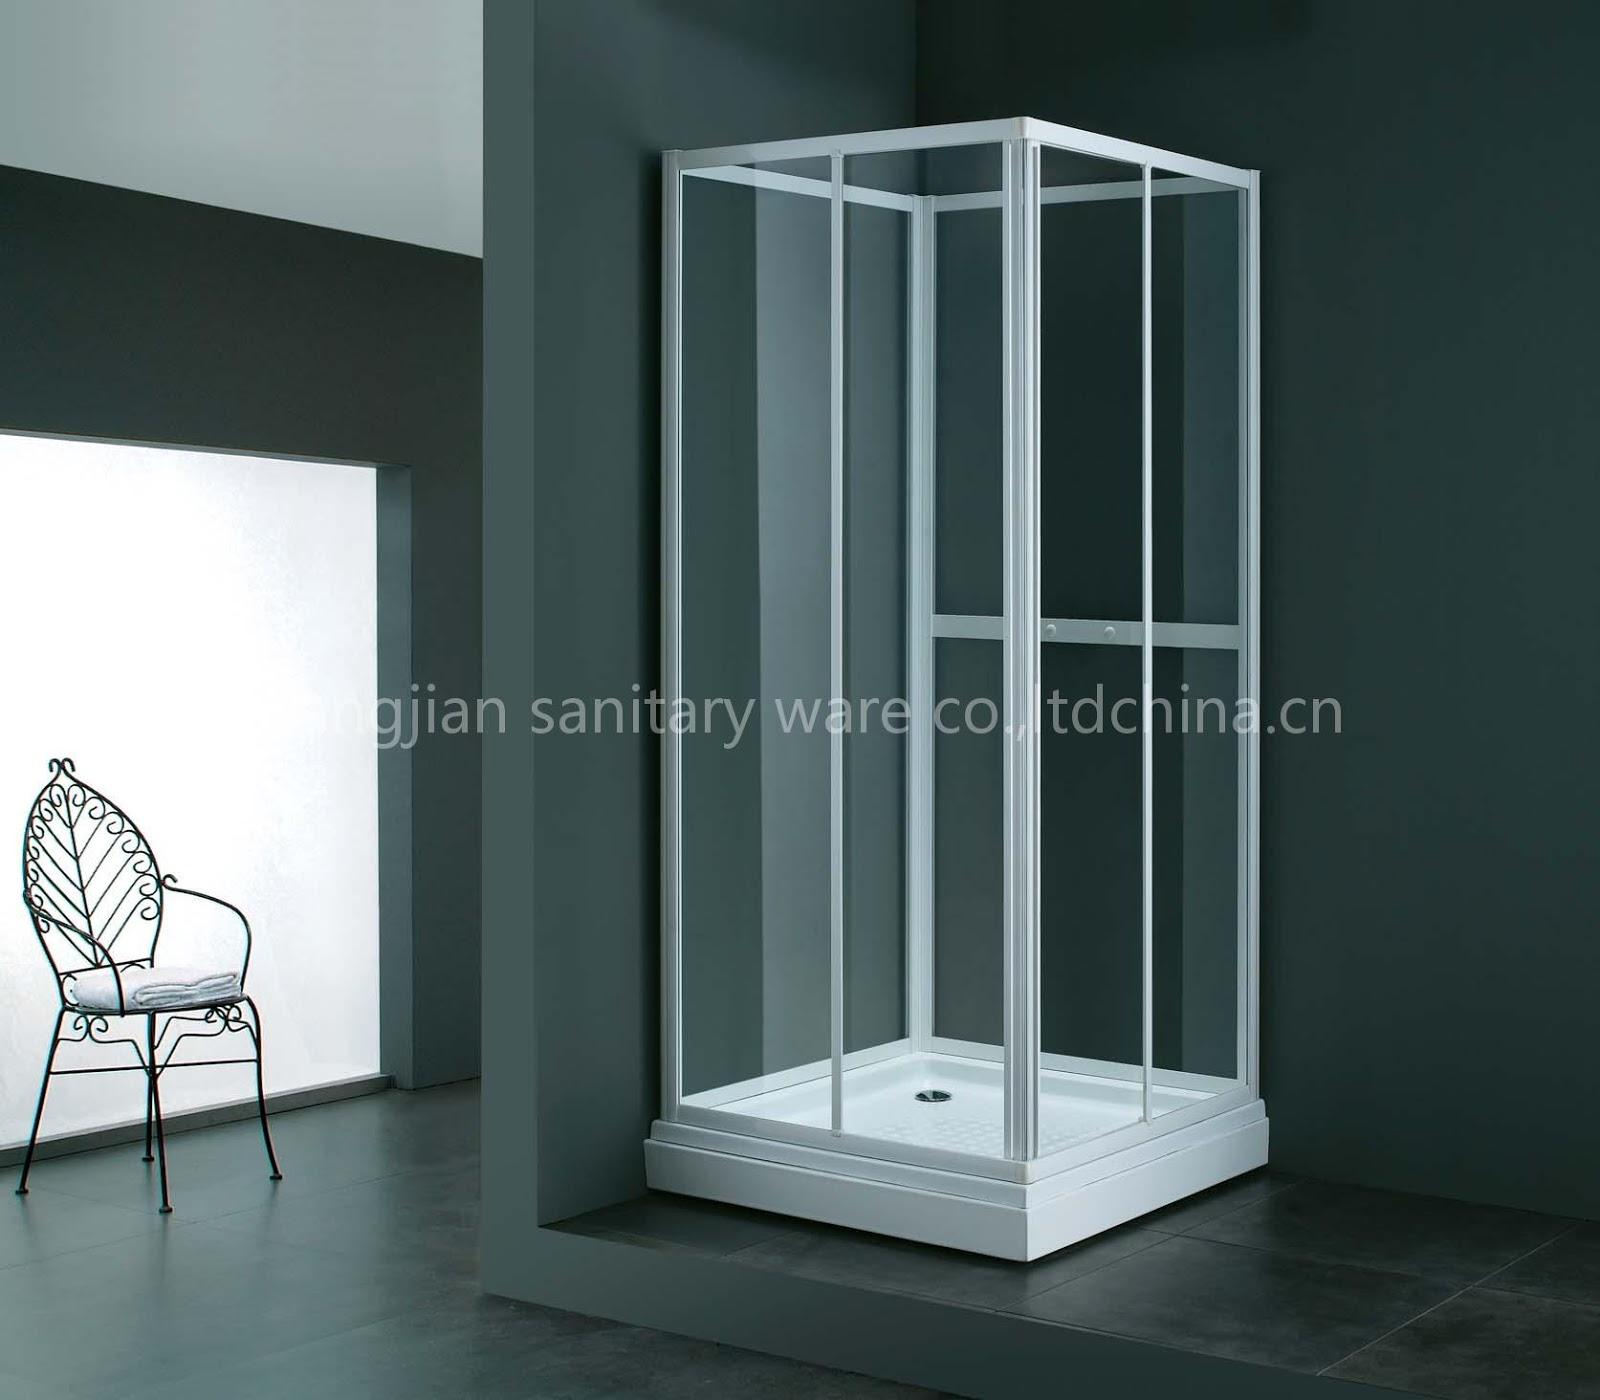 #526F79 Blind Box Vidro temperado para Box de Banheiro 1600x1400 px ver box de vidro para banheiro